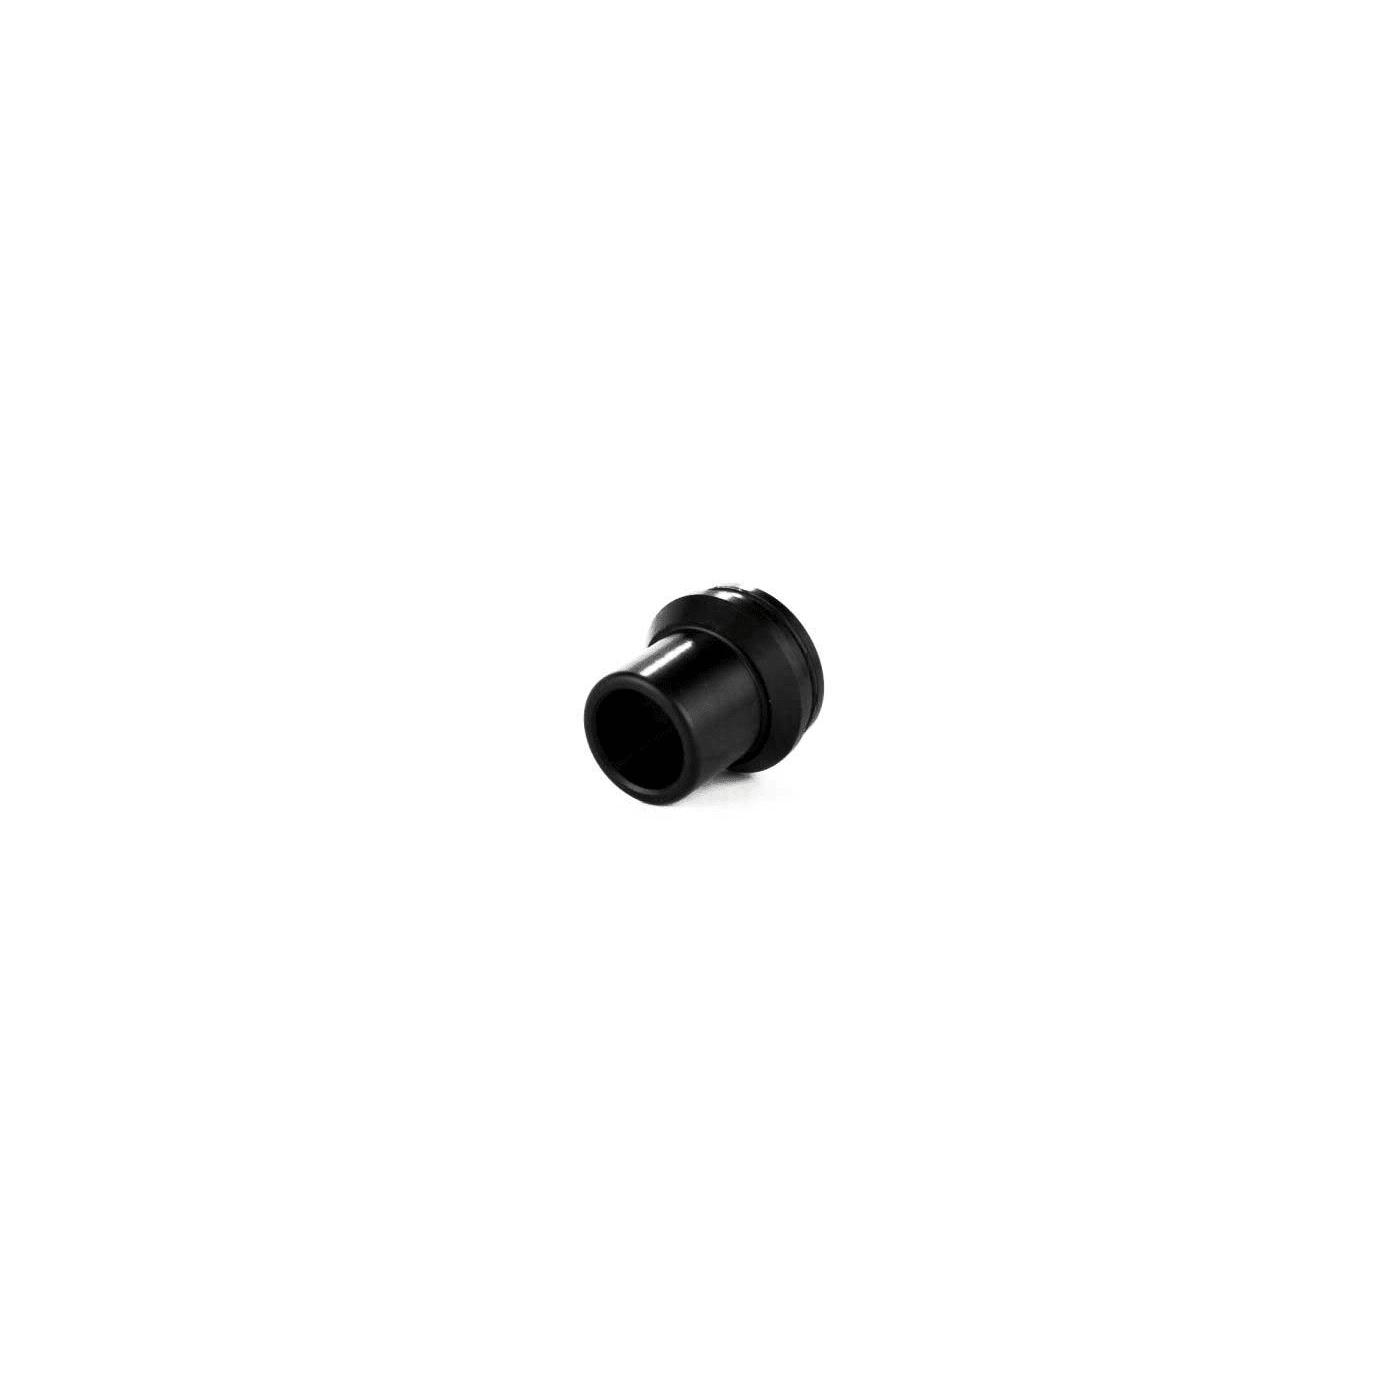 Chuff Enuff Drip Top - Black - Top